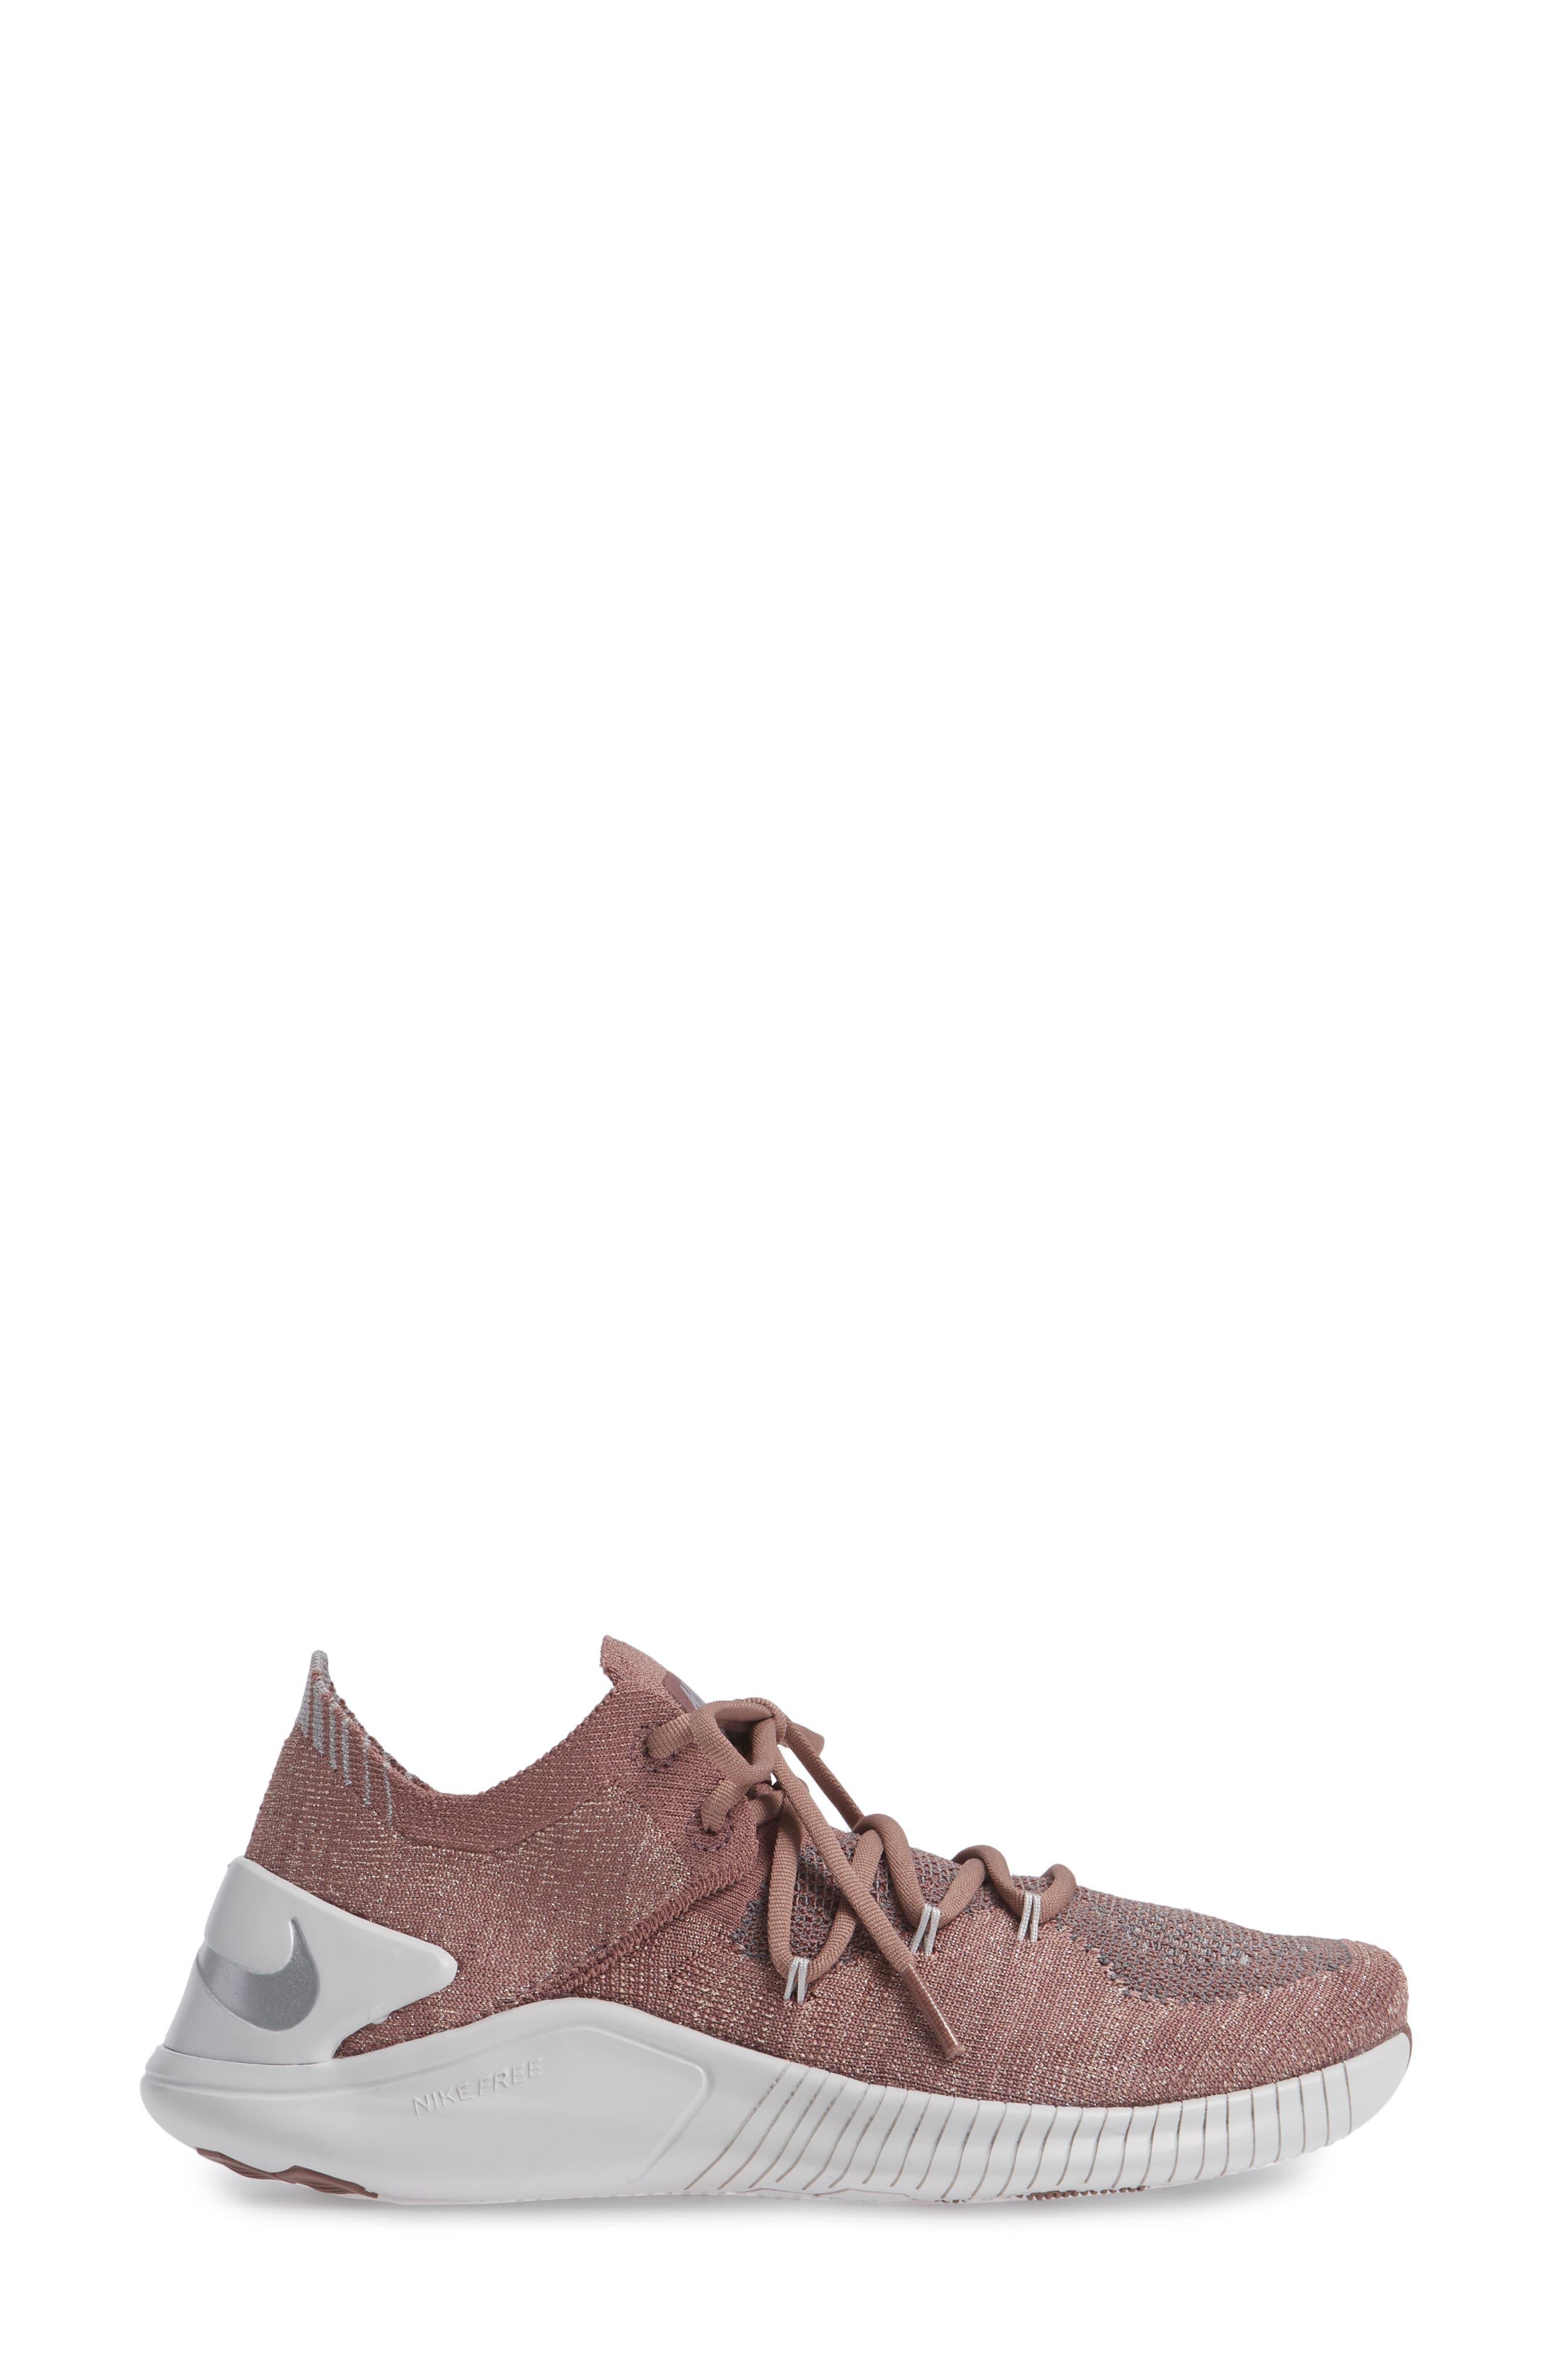 ,                             Free TR Flyknit 3 Training Shoe,                             Alternate thumbnail 80, color,                             650